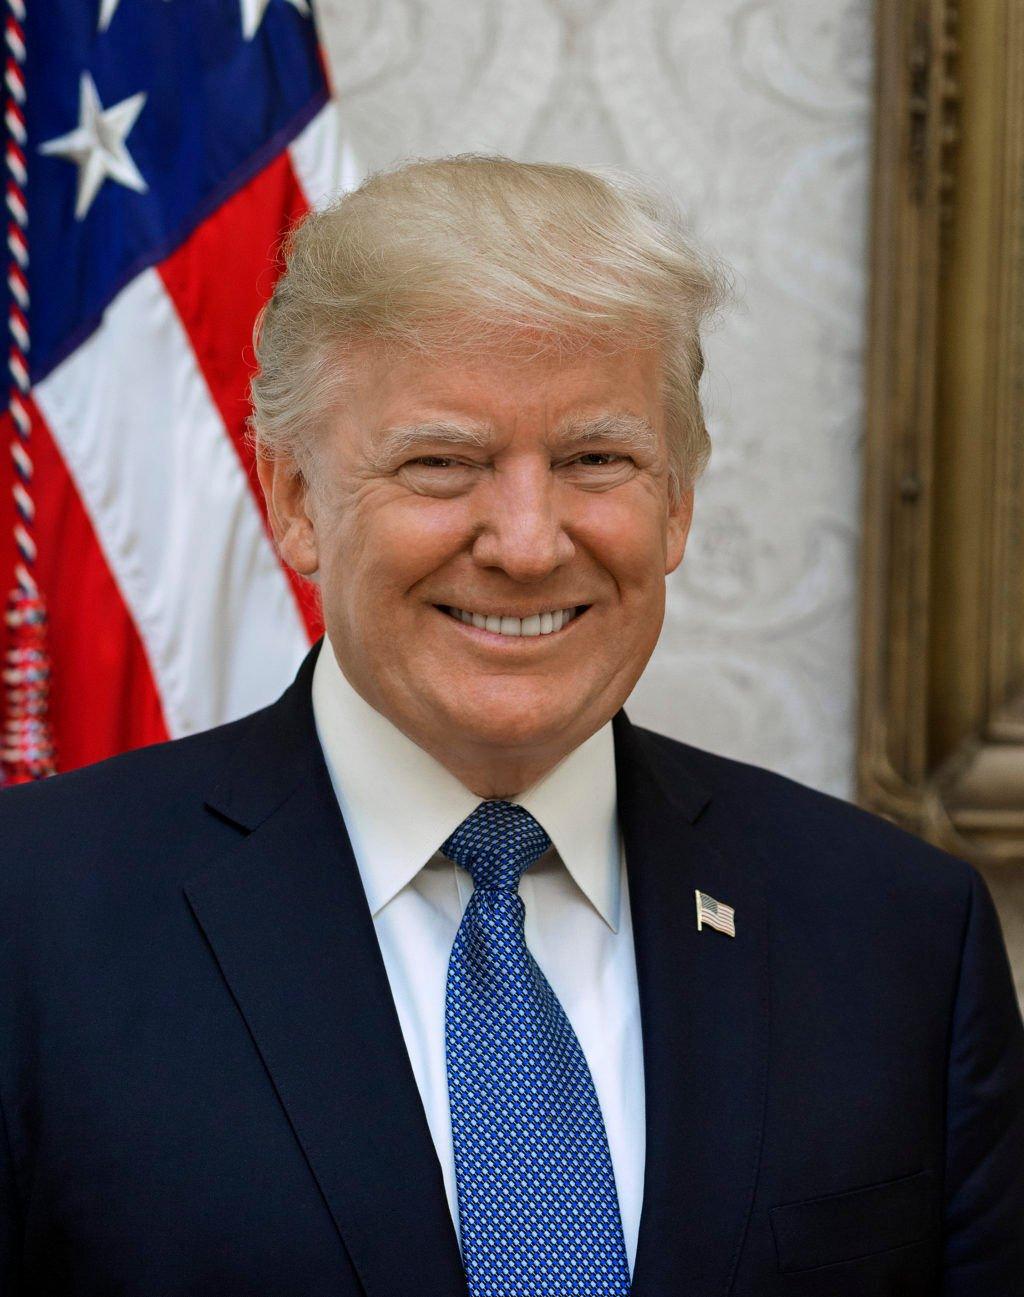 Democrats prepare insurrection incitement charge against Trump